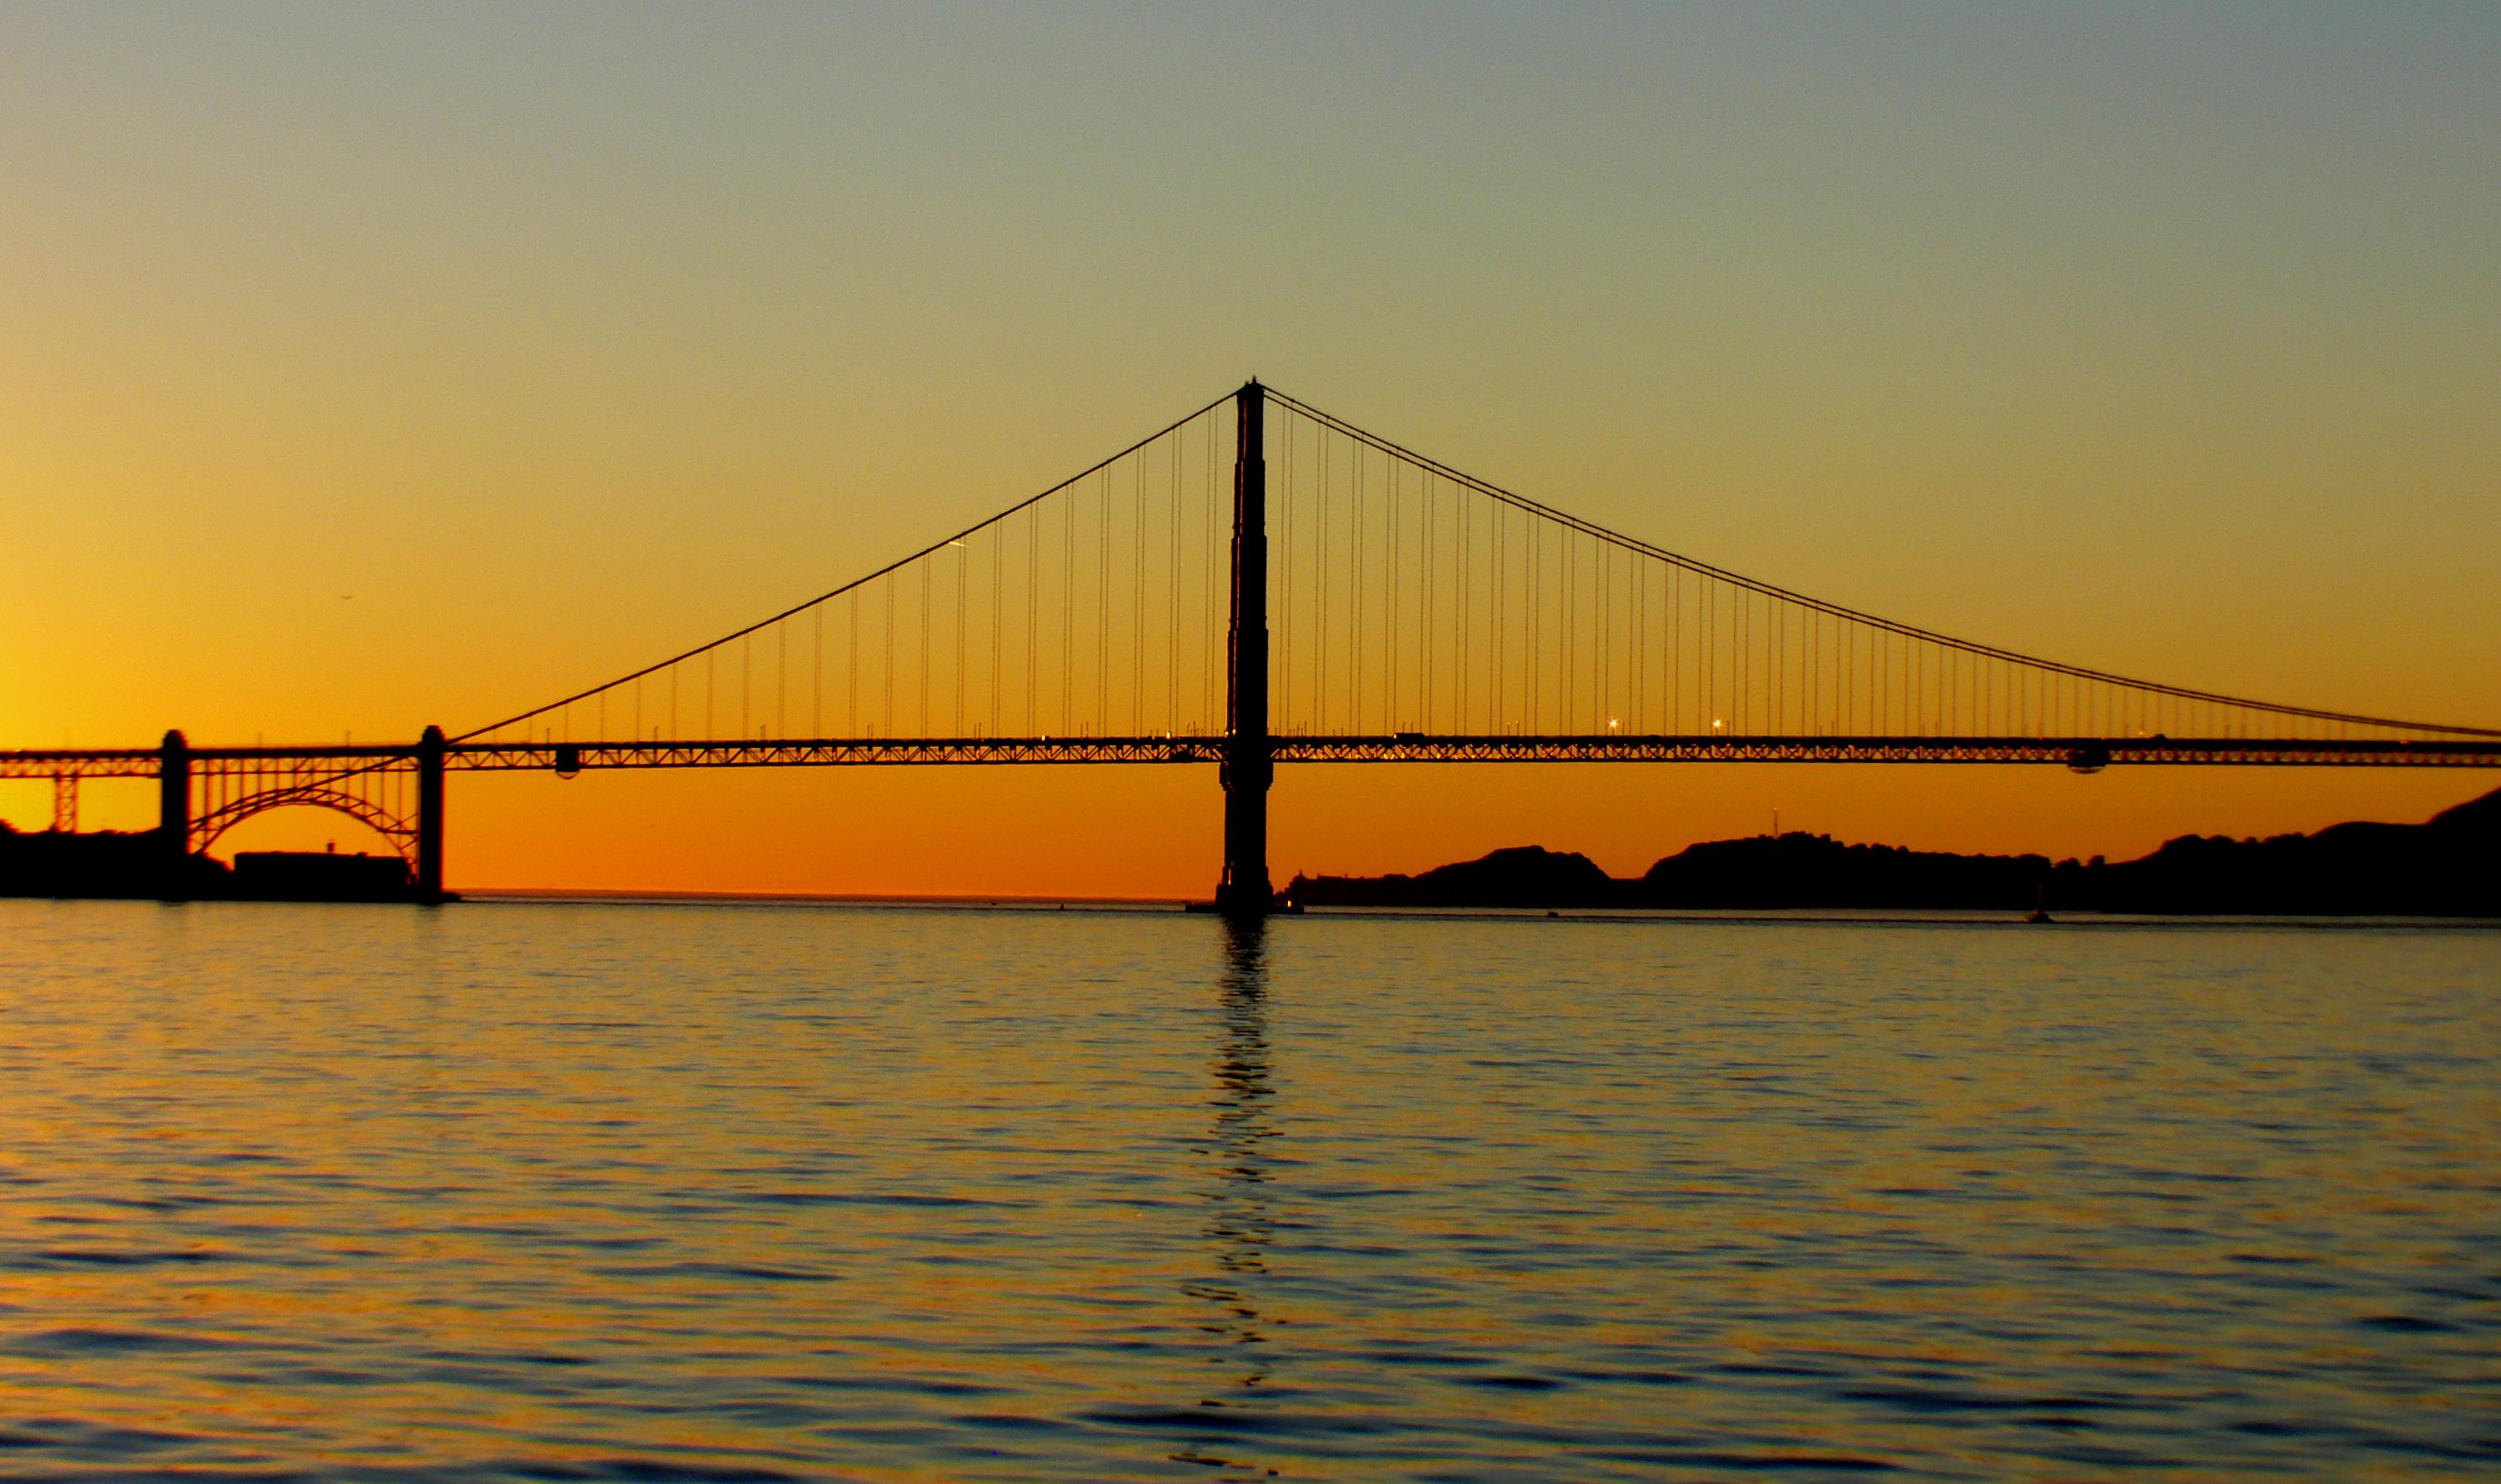 San Francisco Bay (11), Architecture, Boat, Bridge, Free photos, HQ Photo